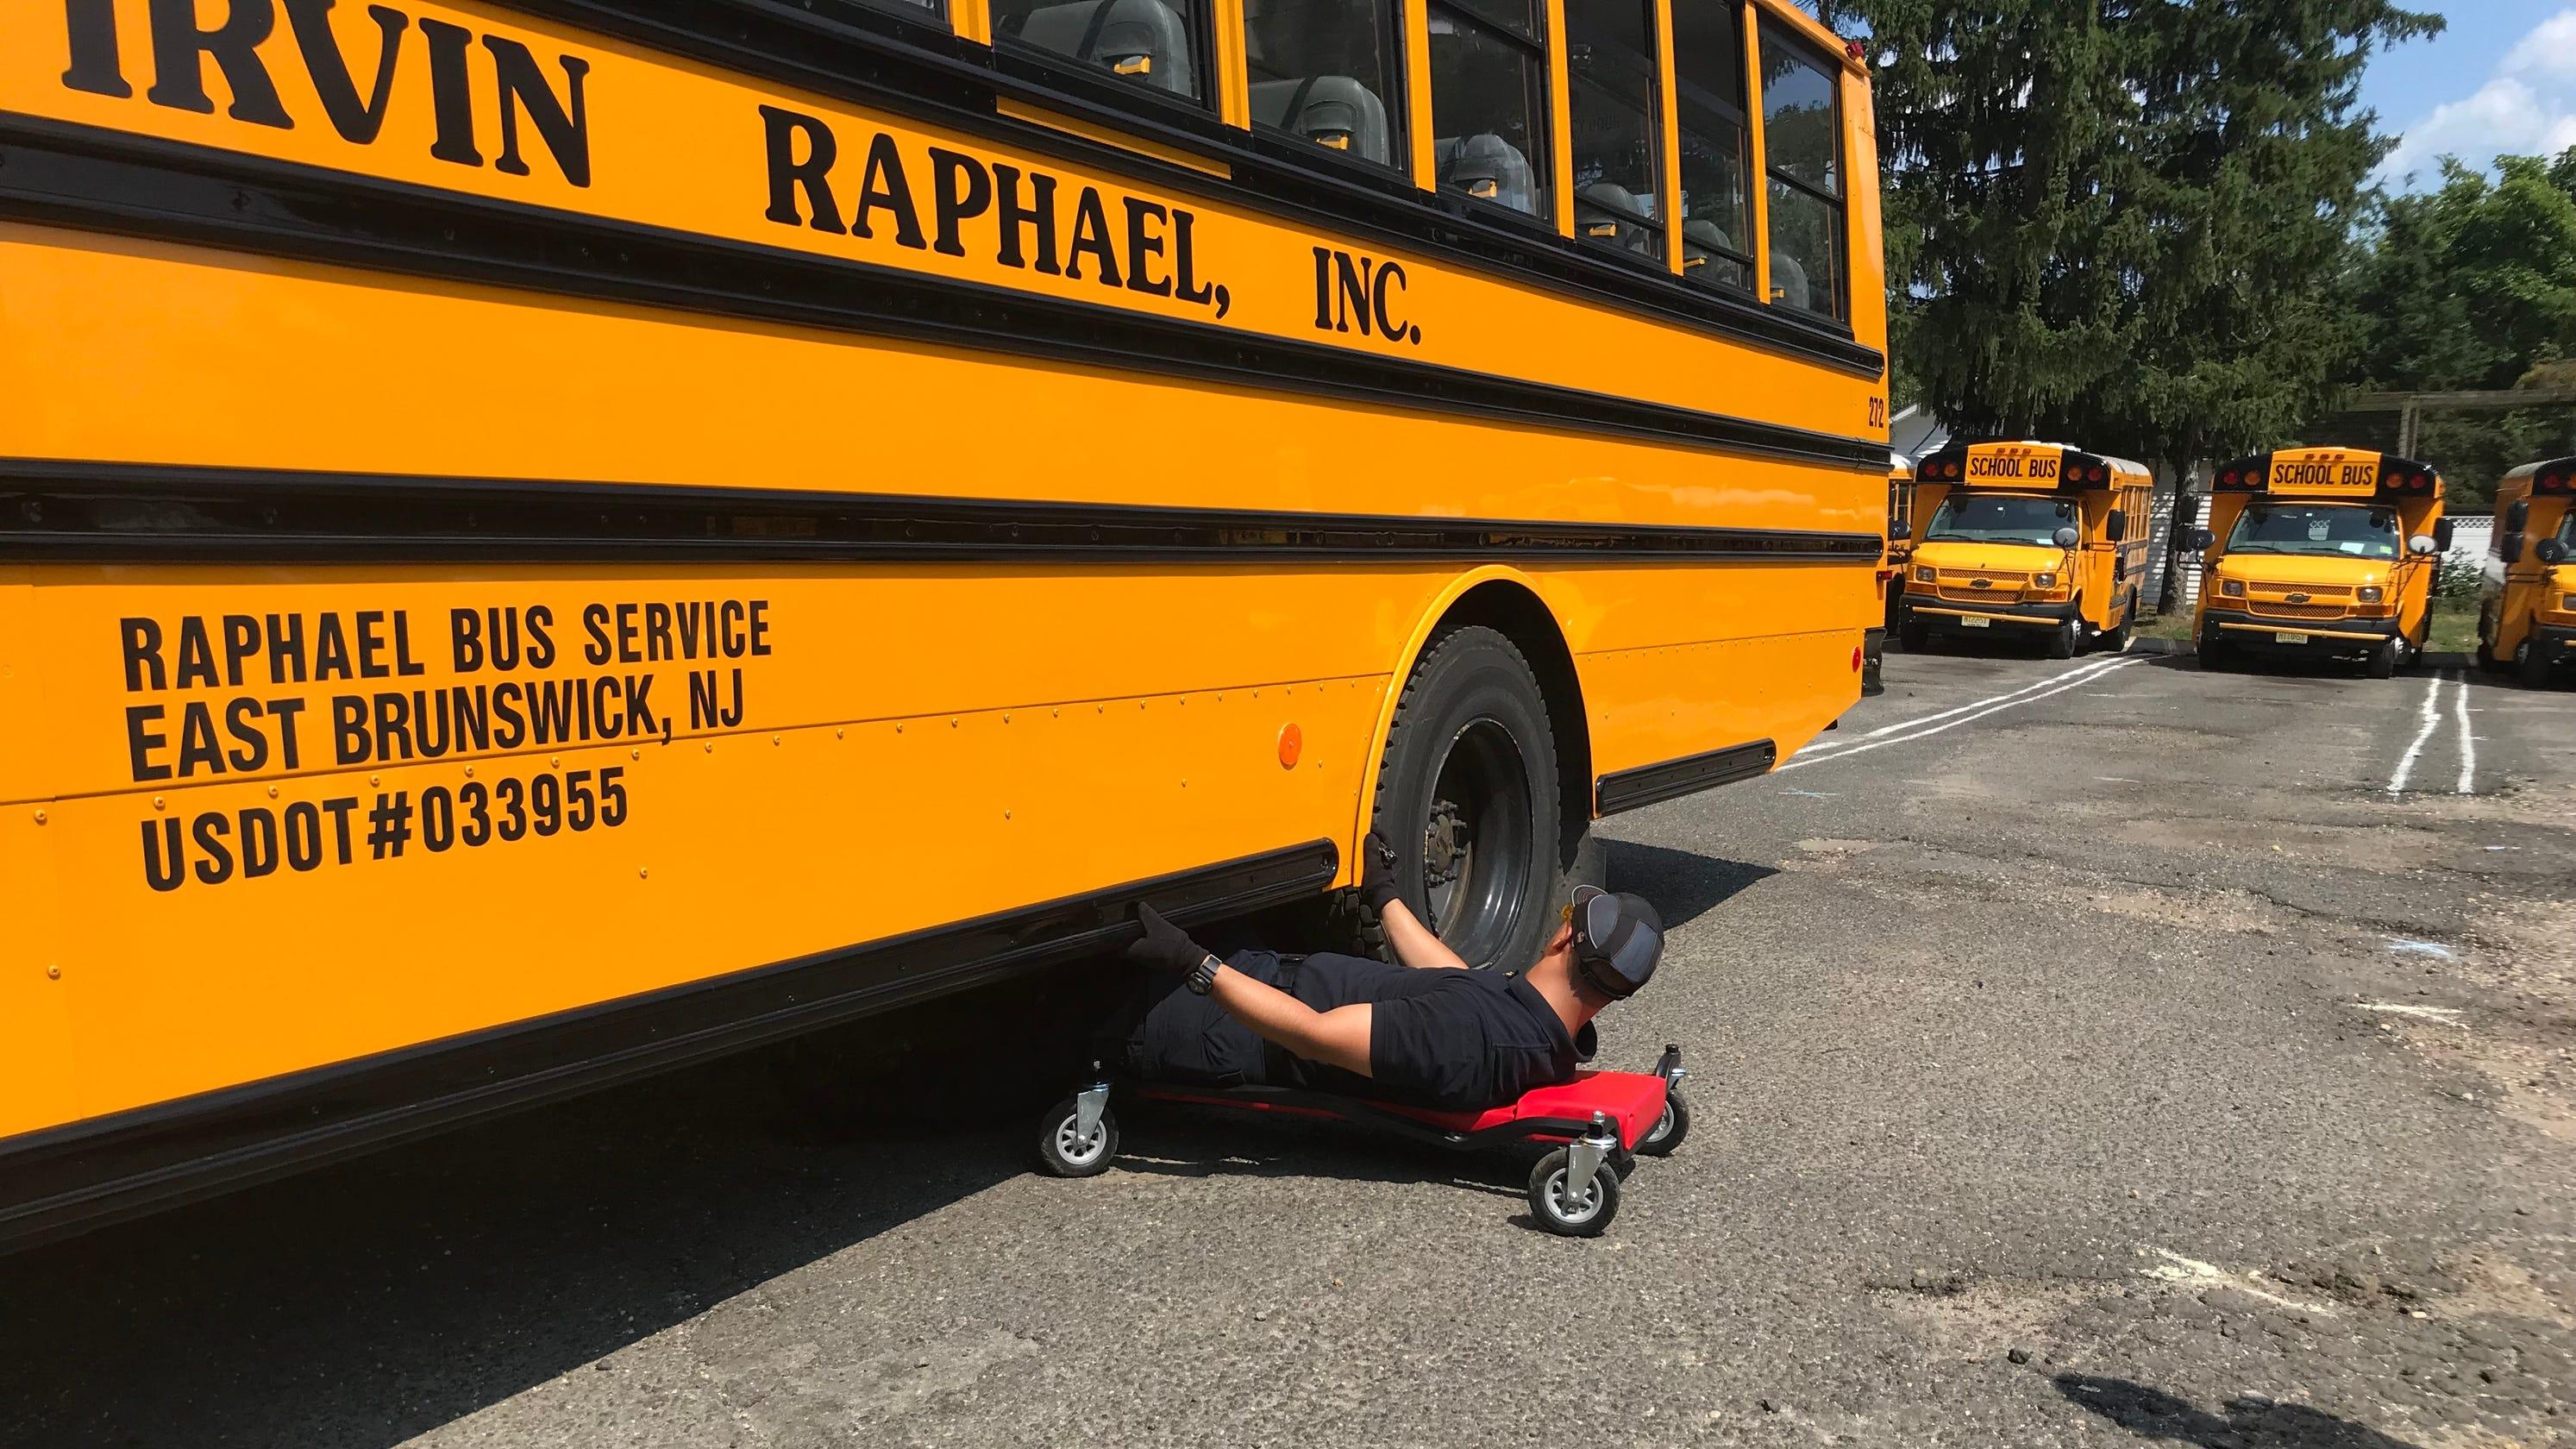 nj mvc 39 s school bus inspection unit conducts safety checks at irvin raphael inc. Black Bedroom Furniture Sets. Home Design Ideas